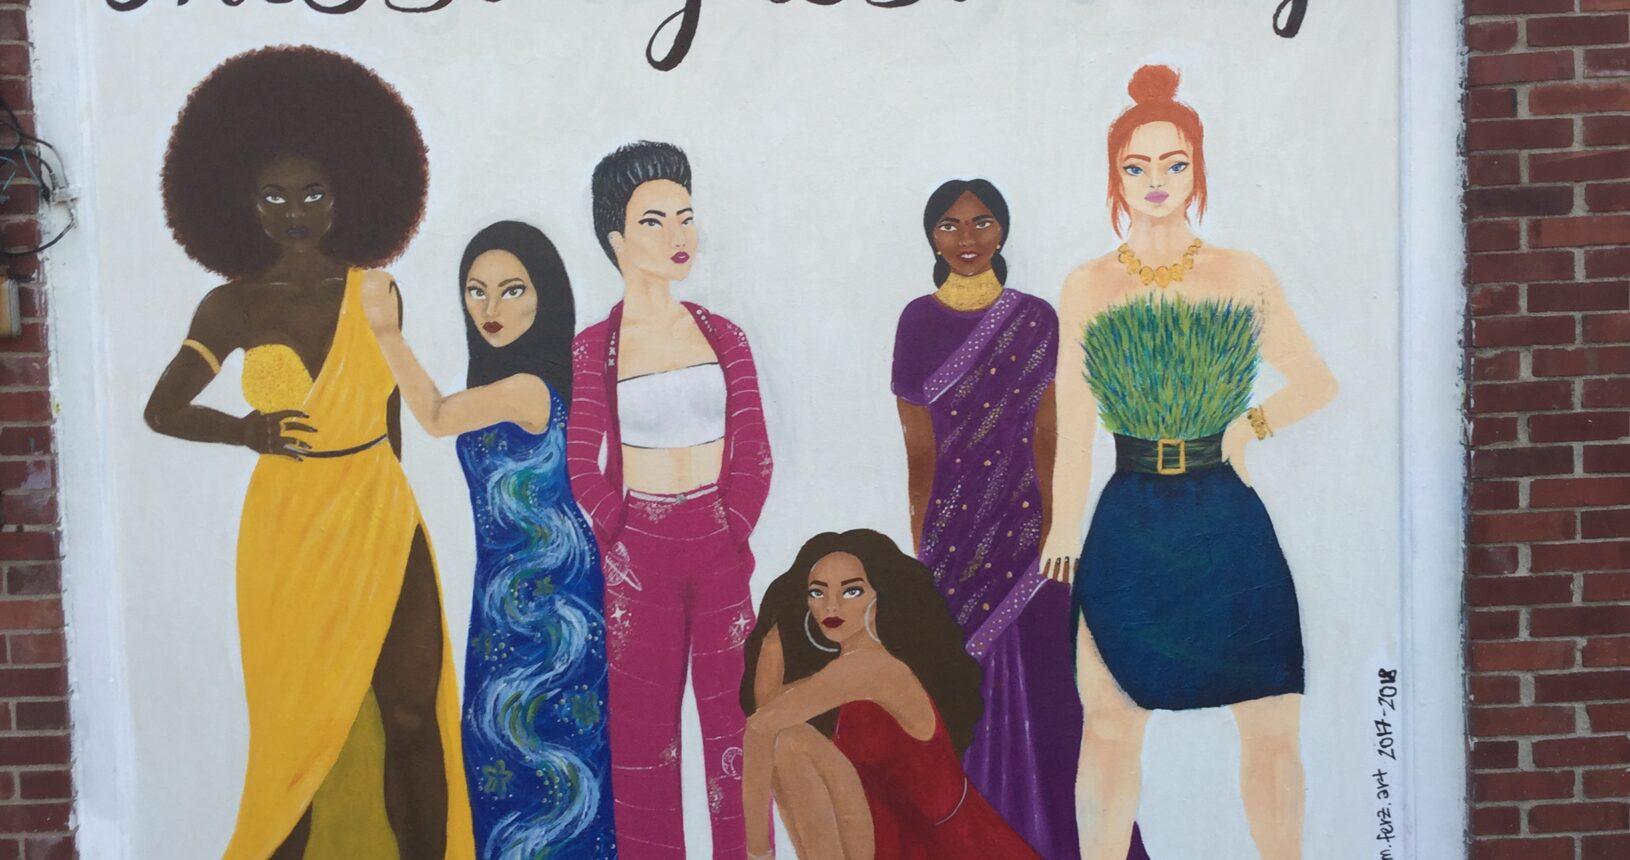 Maya Ferzandi's 2017 mural